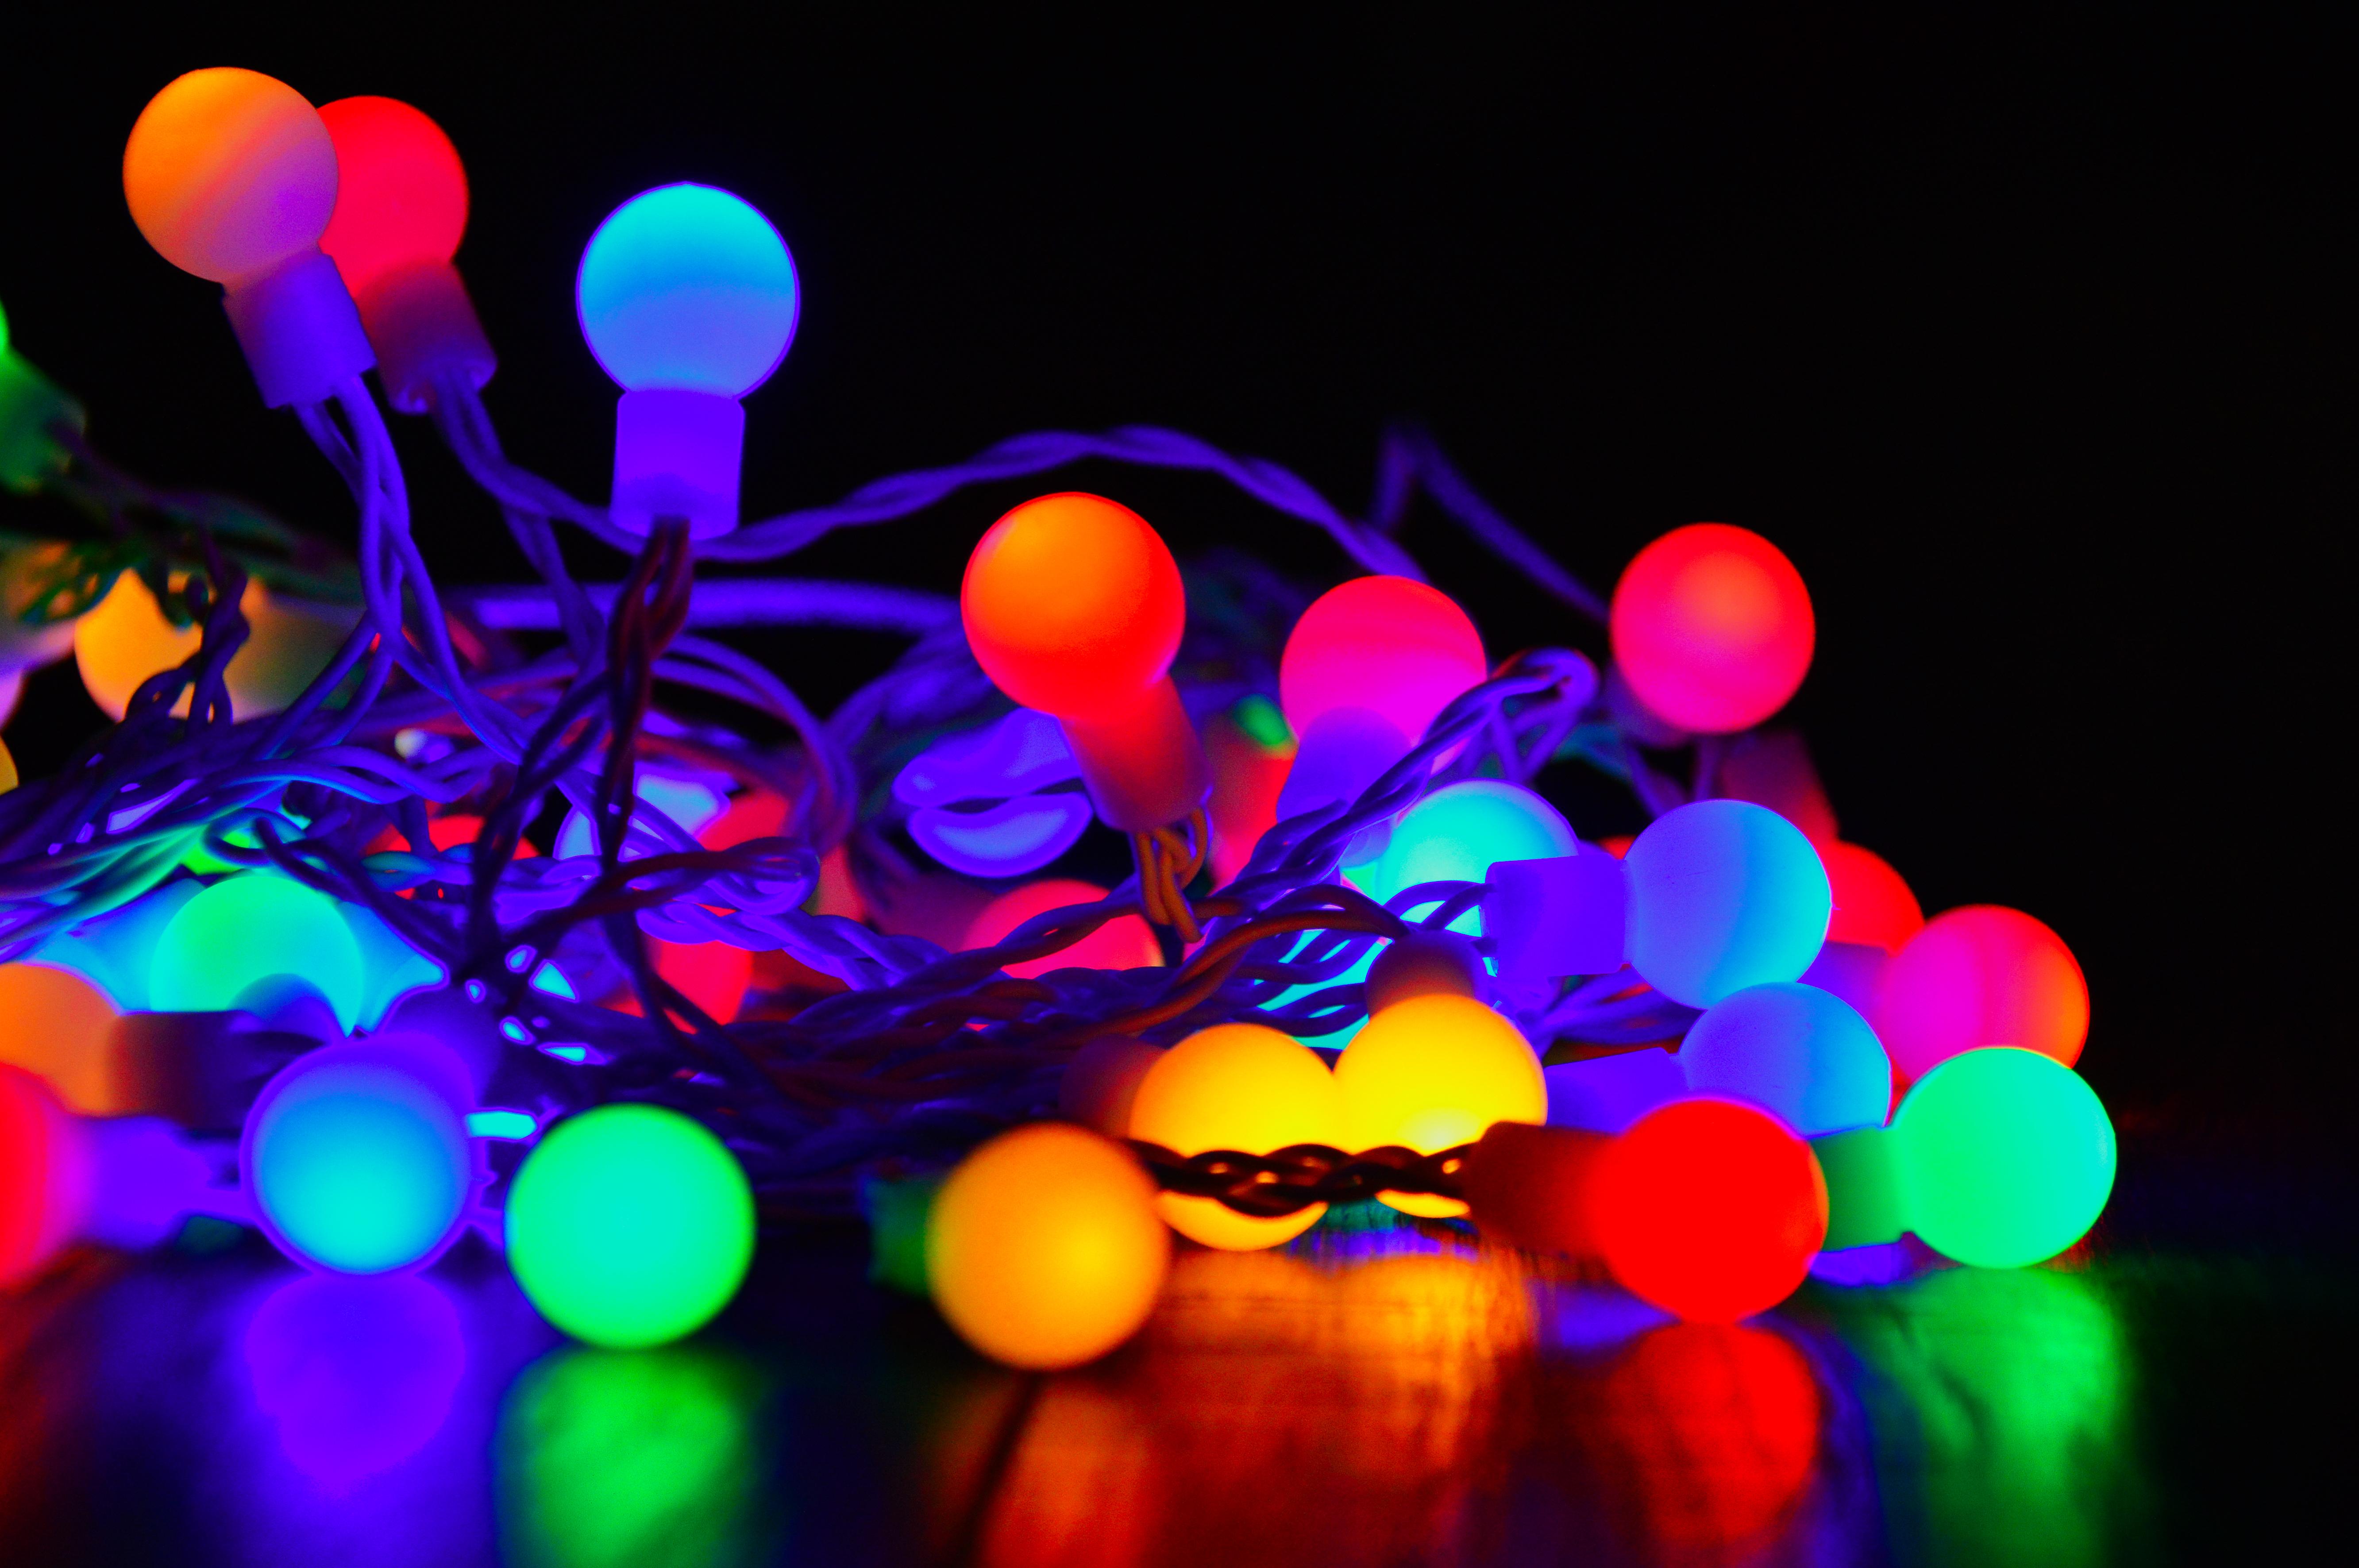 ... blue, decoration, vector, glowing, festive, field, celebratory, white, illustration, design, lighting, night, computer wallpaper, neon, fete, christmas ...